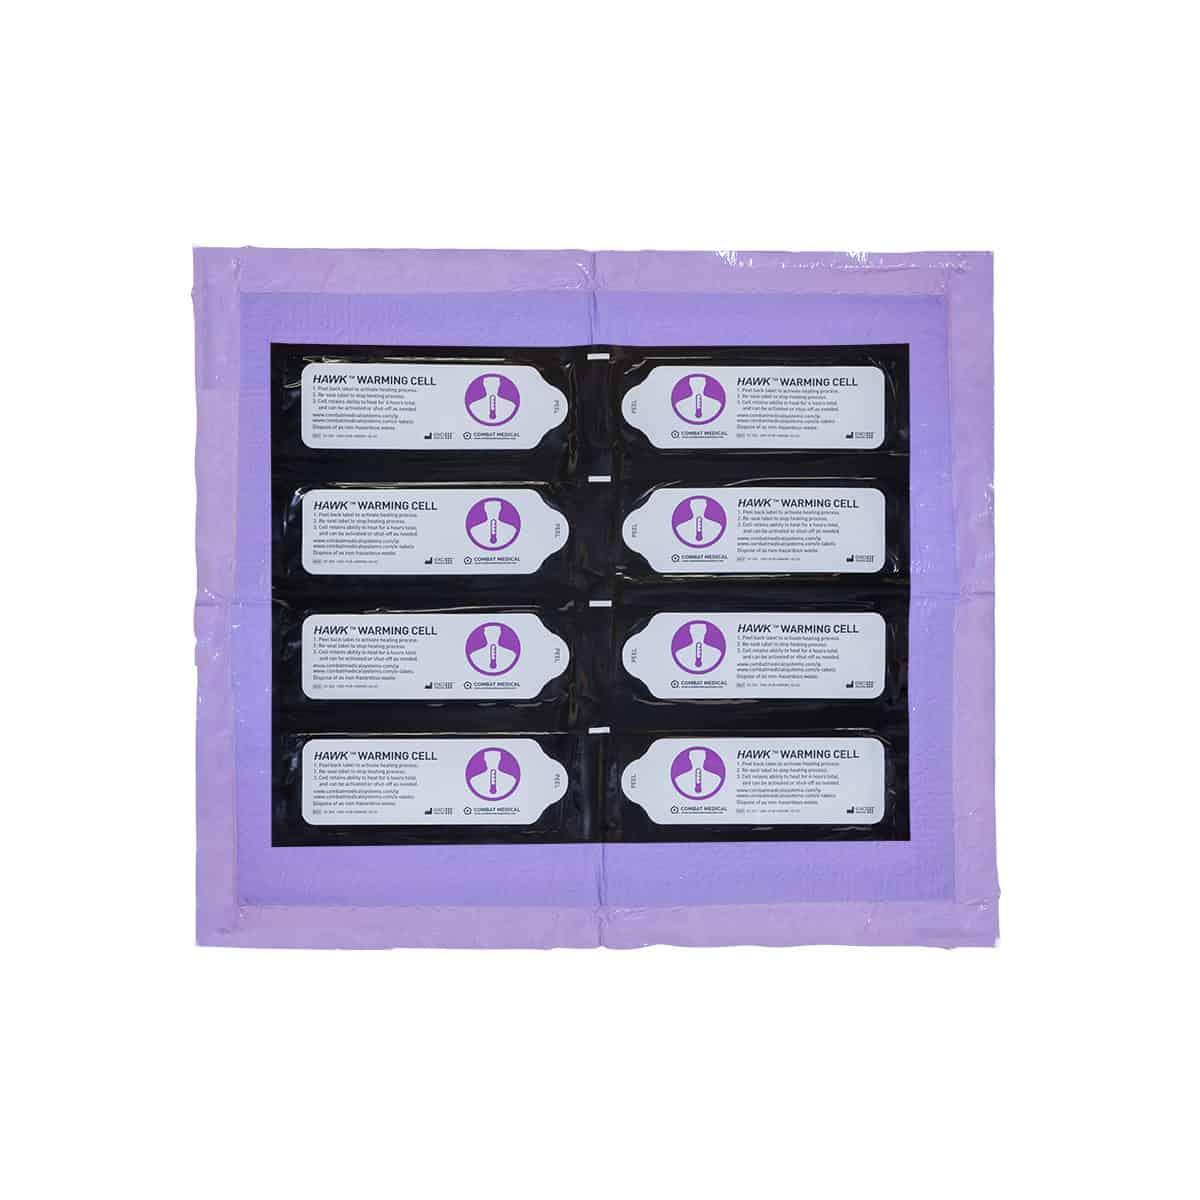 HAWK™ warning grid with pad